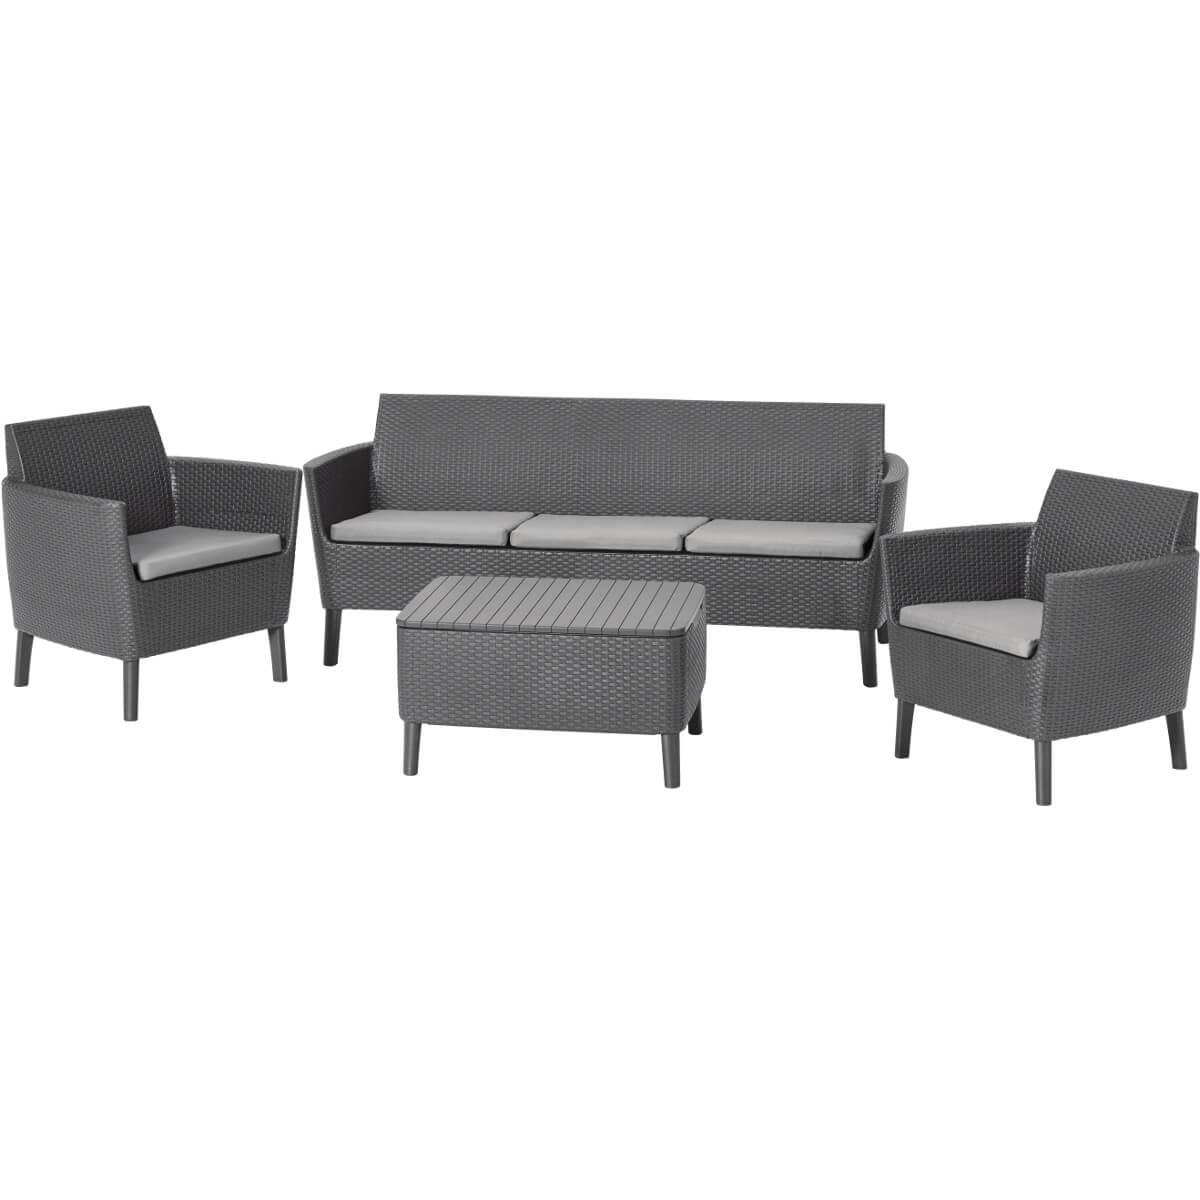 Комплект мебели Allibert Salemo 3 Seater 17205990